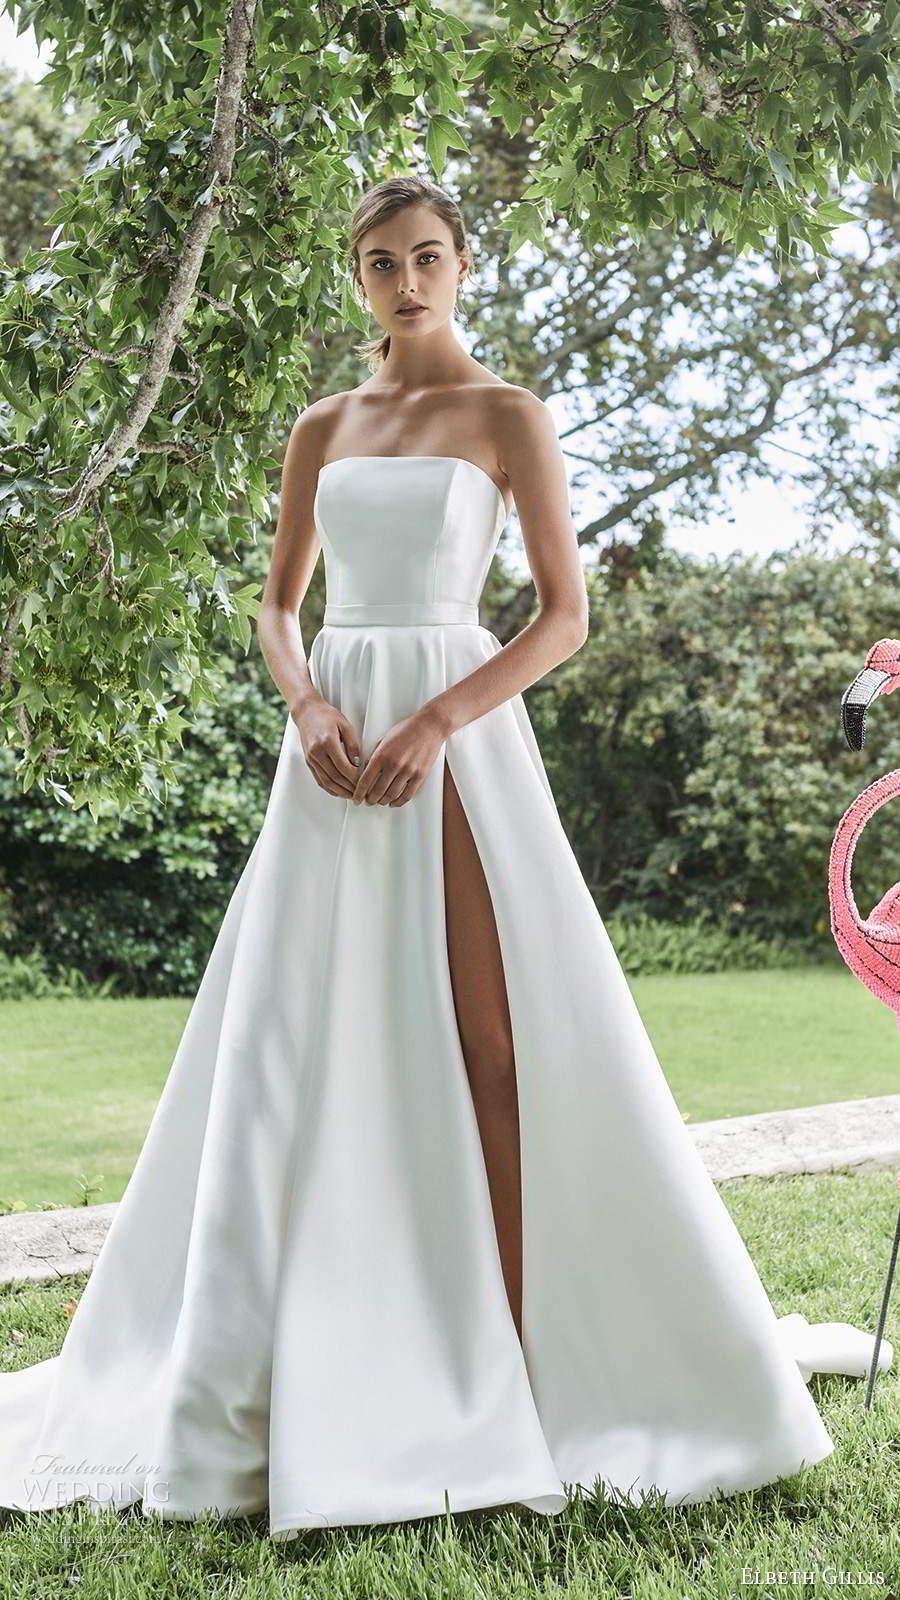 elbeth gillis 2021 bridal strapless straight across clean minimalist a line ball gown wedding dress slit skirt chapel train (10) mv